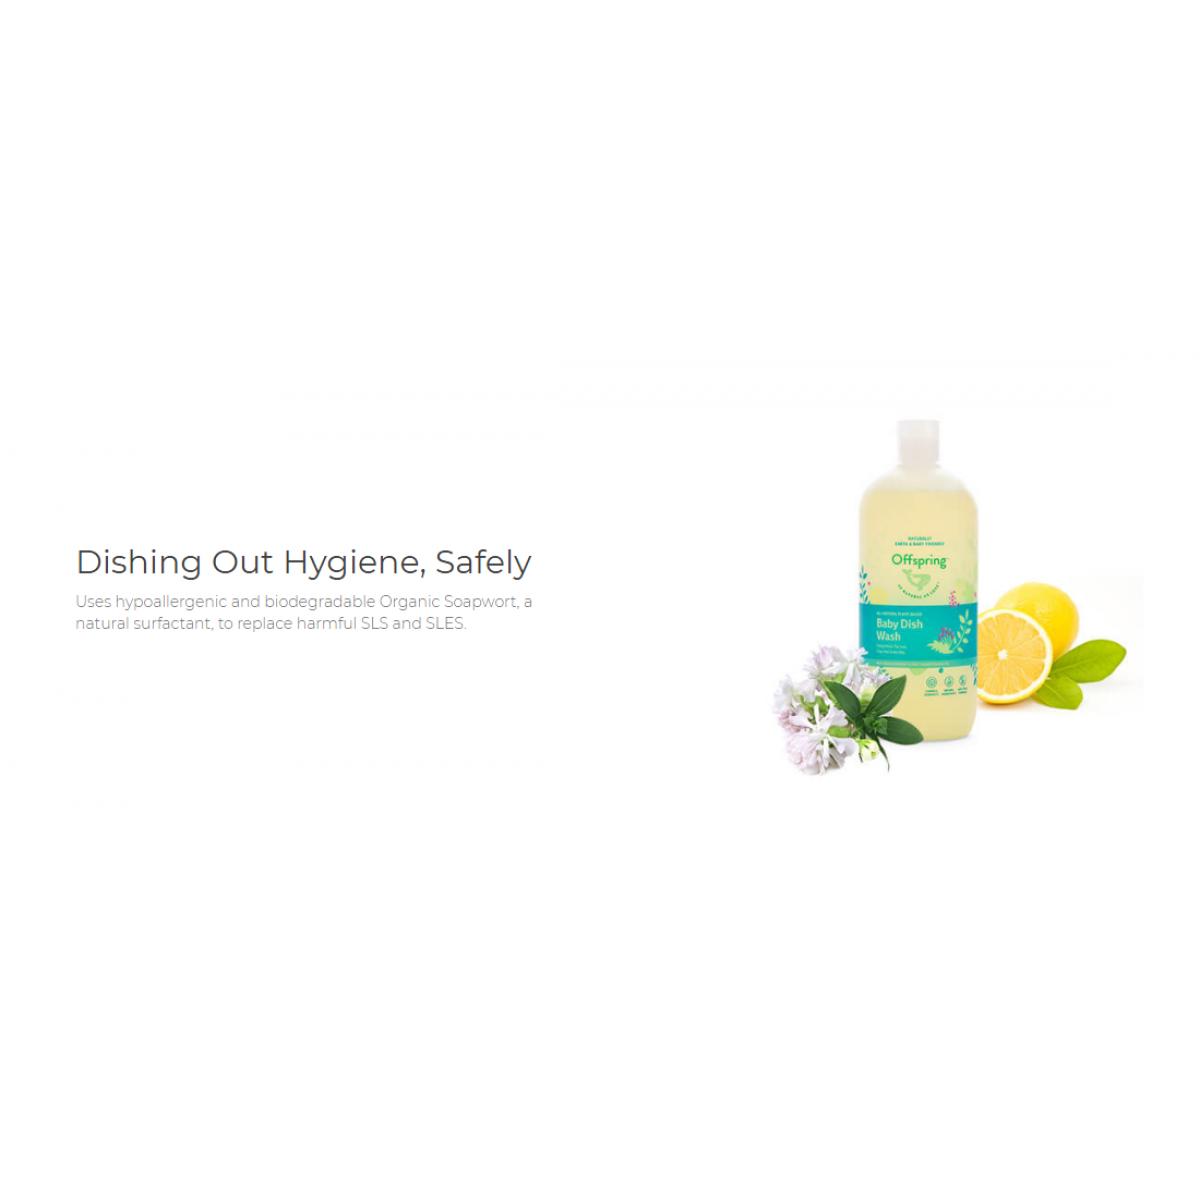 Offspring Organic Baby Dish Wash 500ml - Product of Autstralia